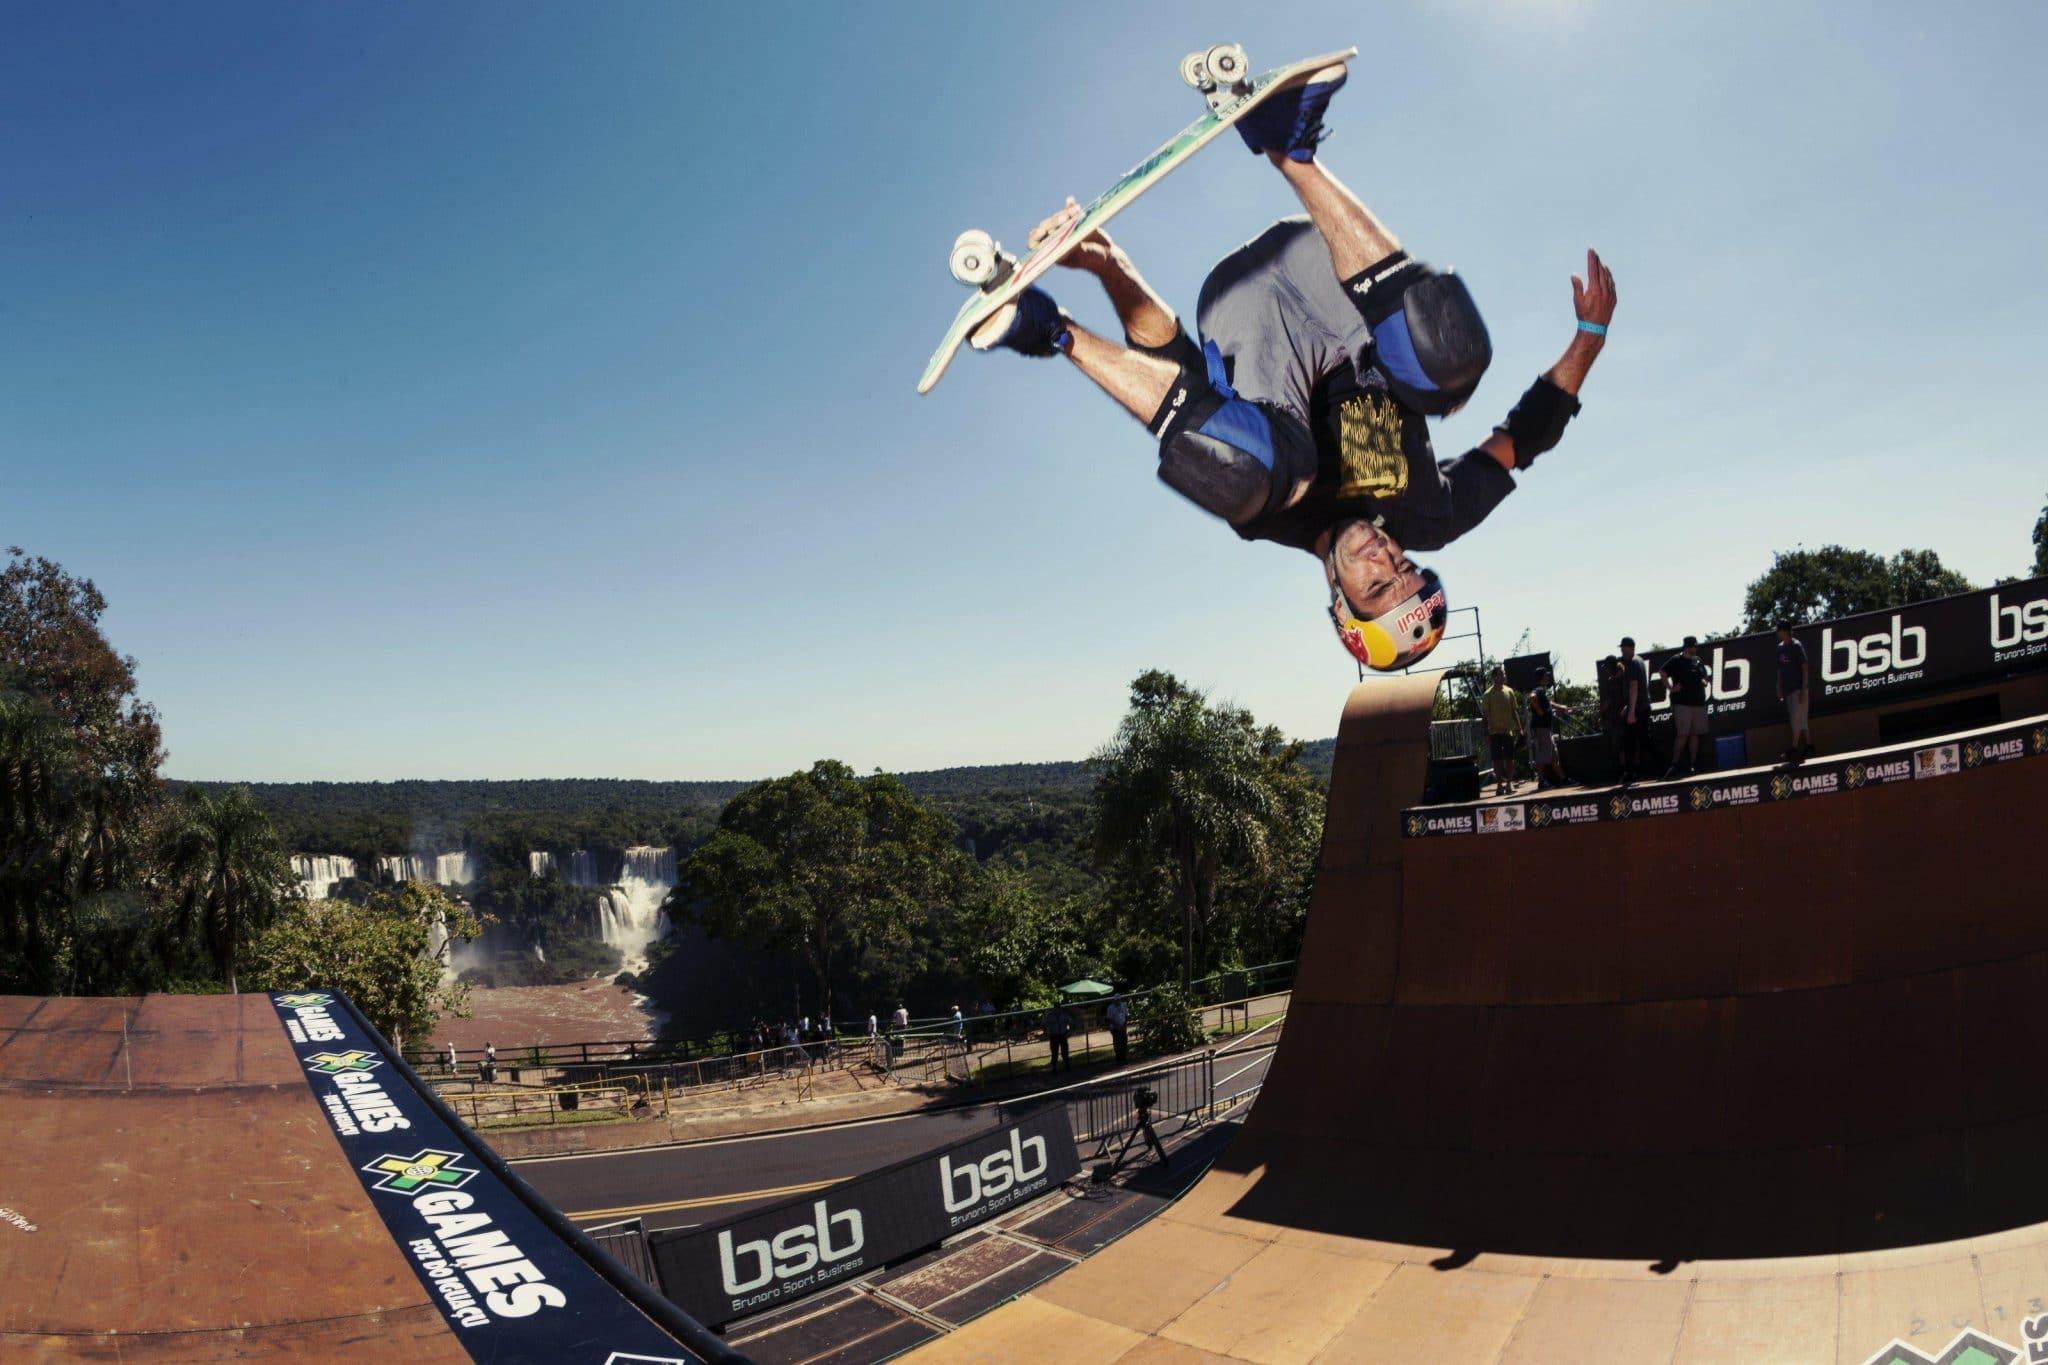 Sandro Dias skate vertical